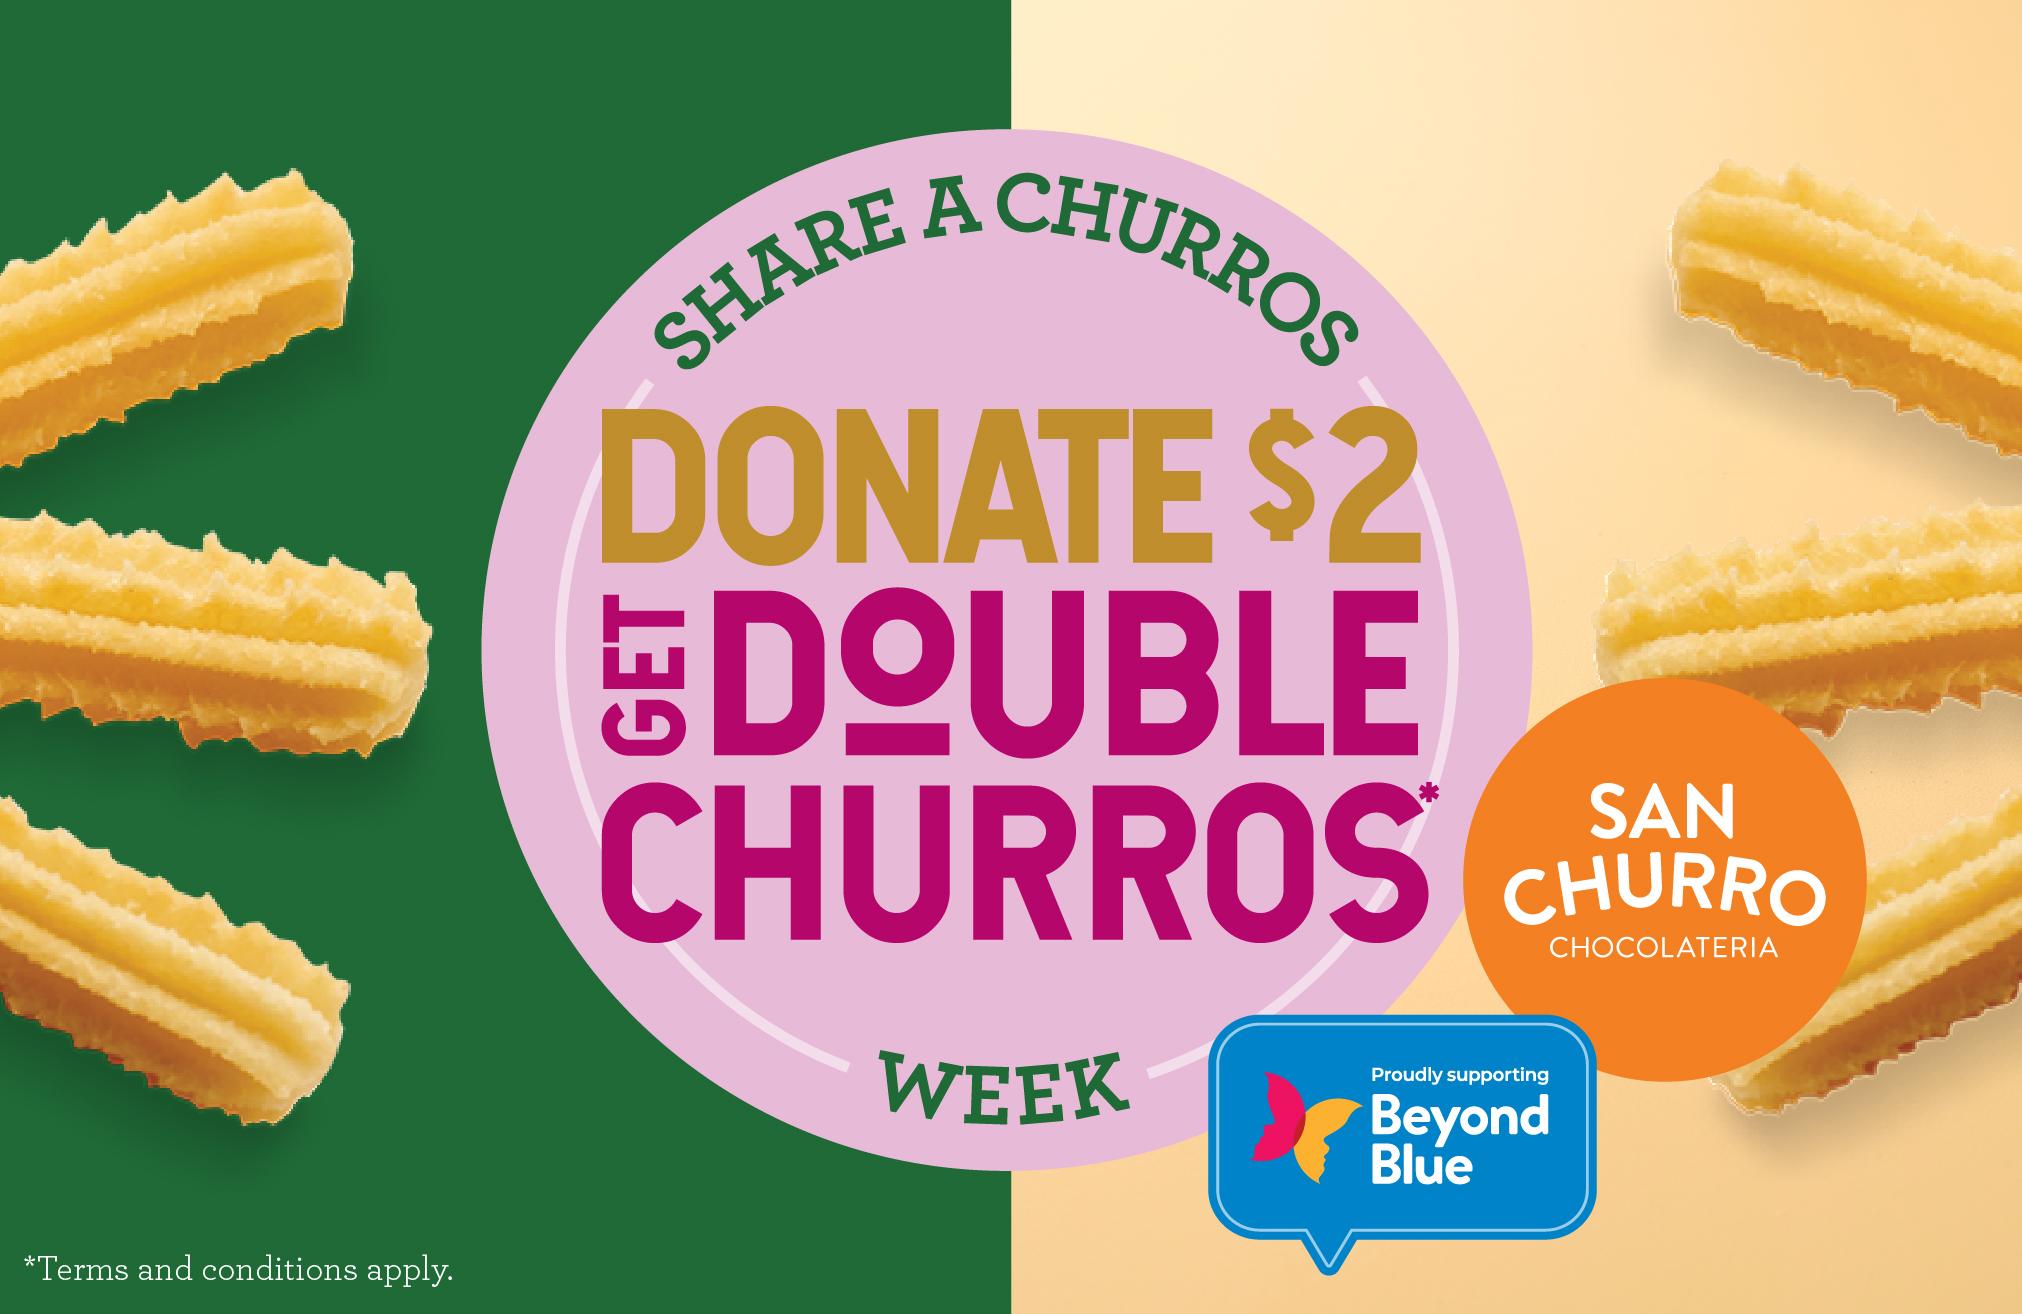 Share a Churros Week